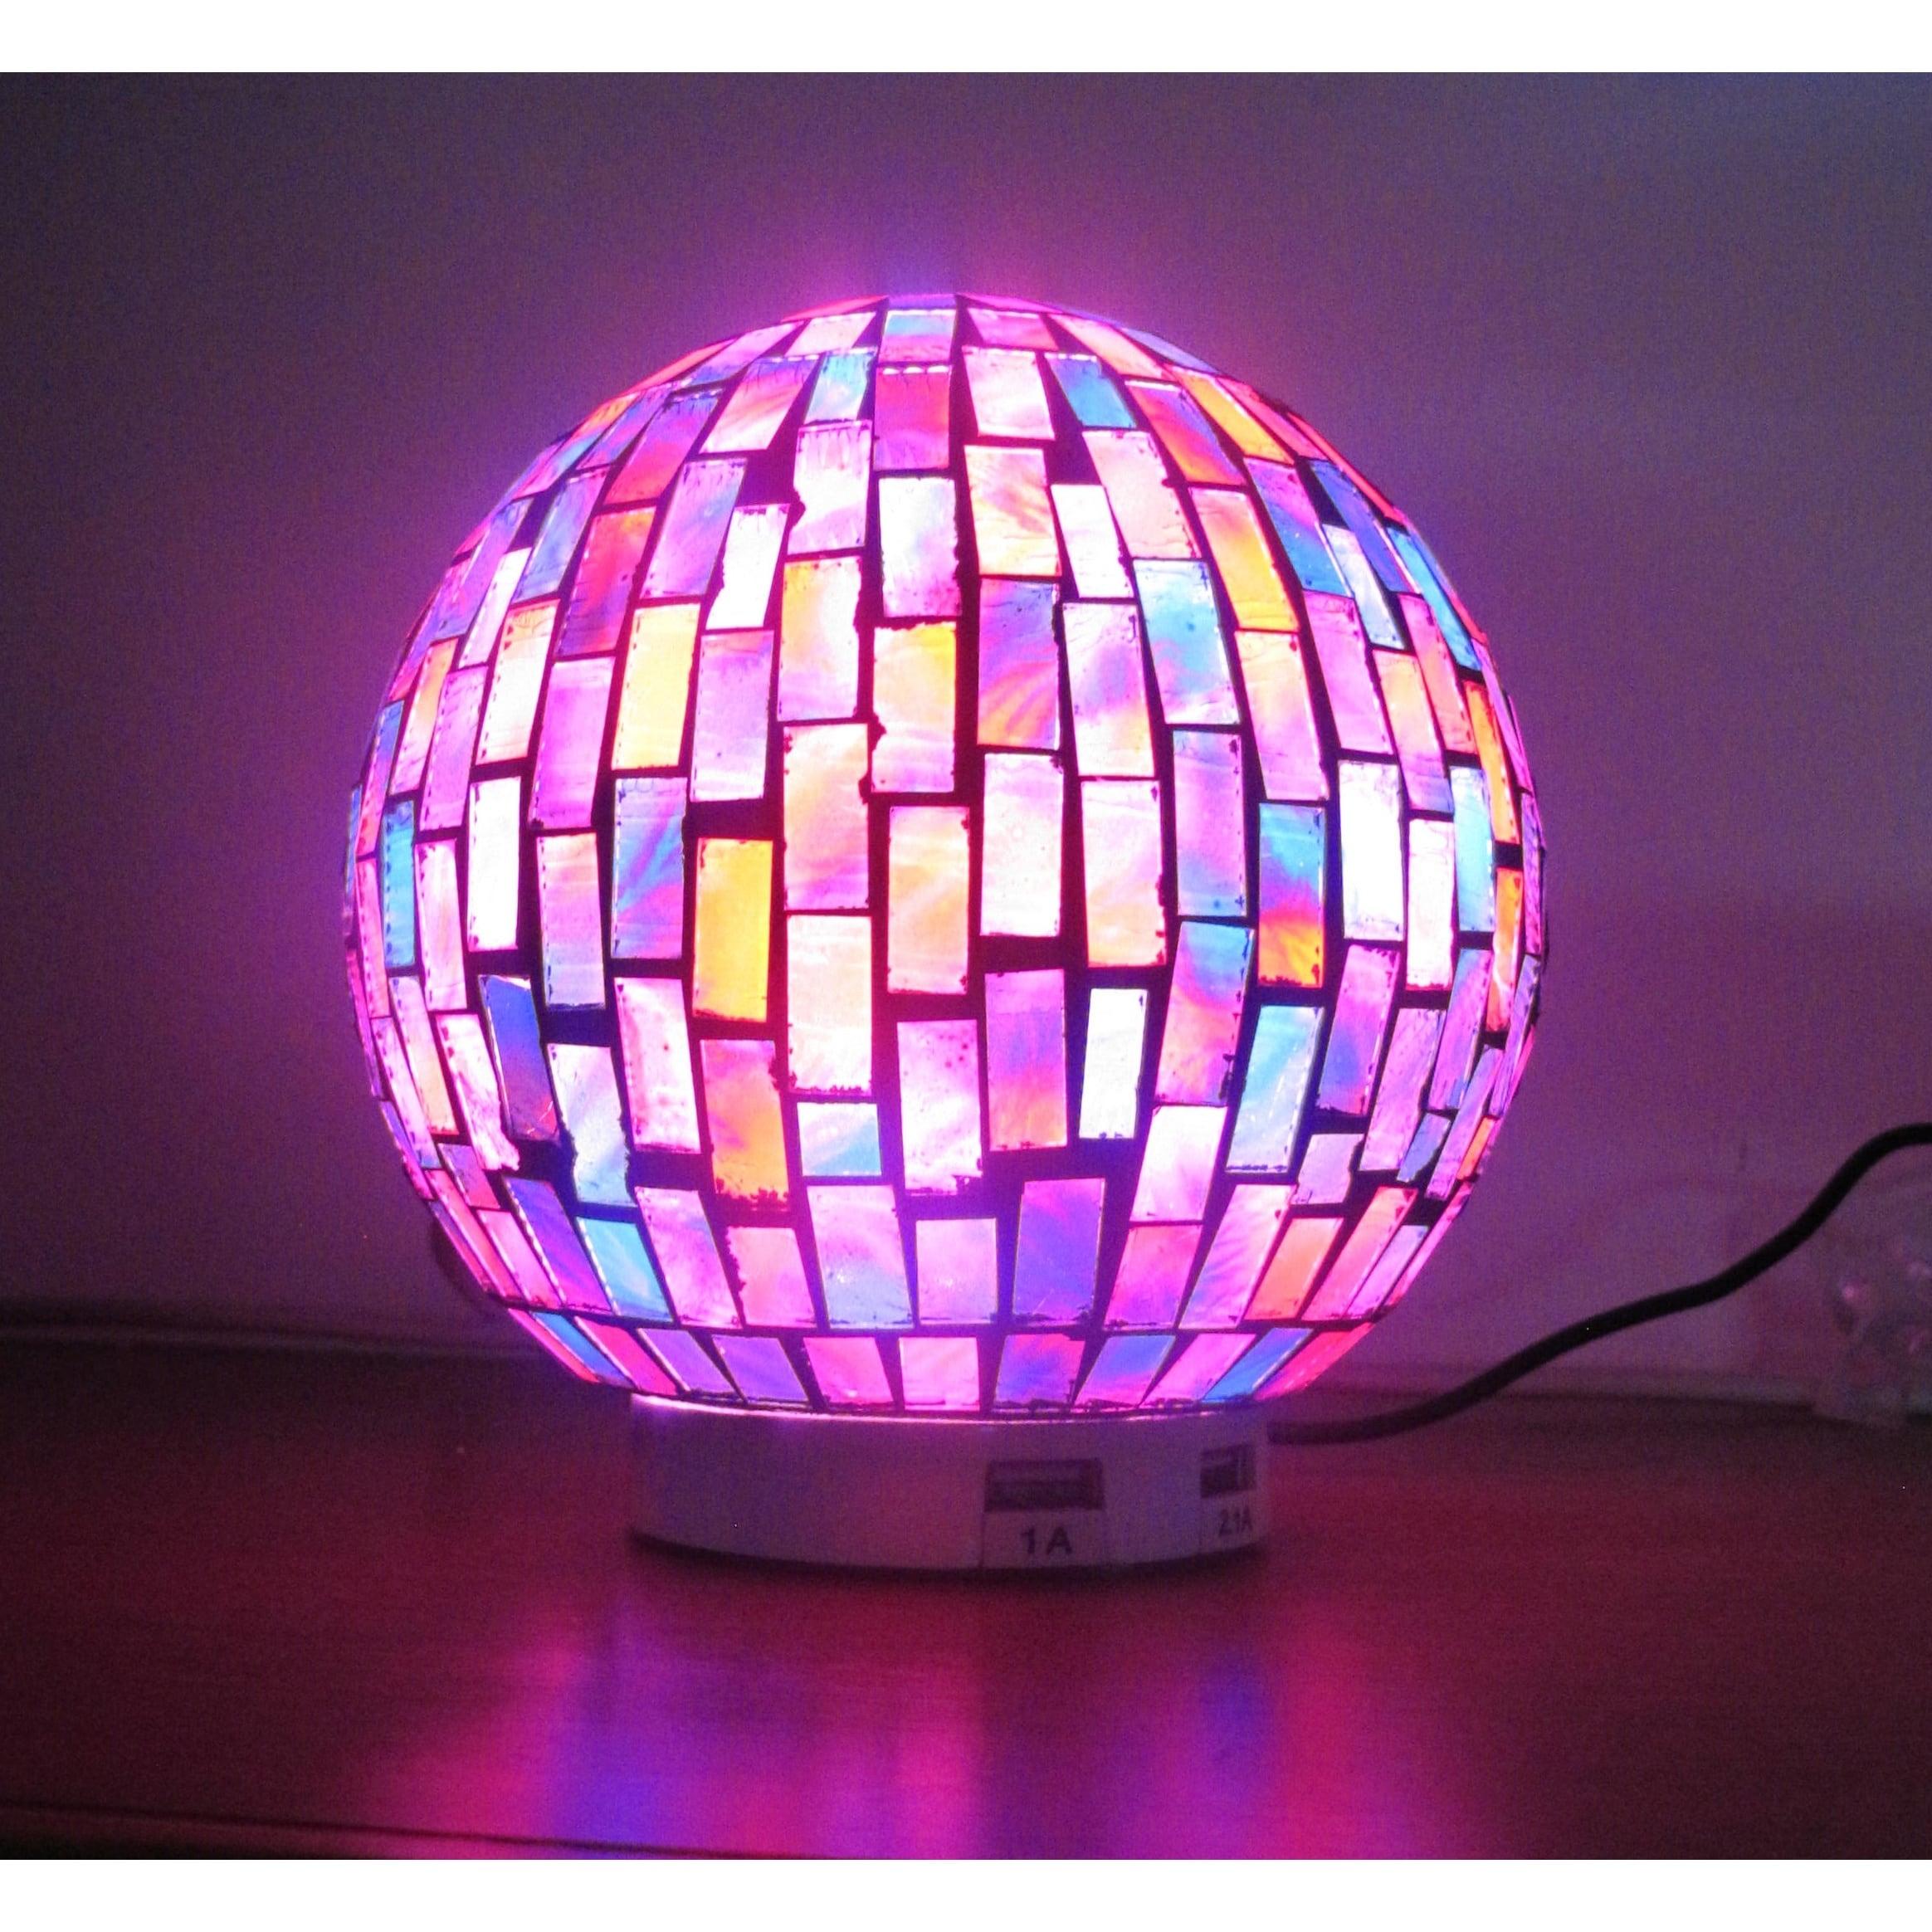 L.Idea Mosaic Globe Zen LED Table Lamp with Dual USB Char...